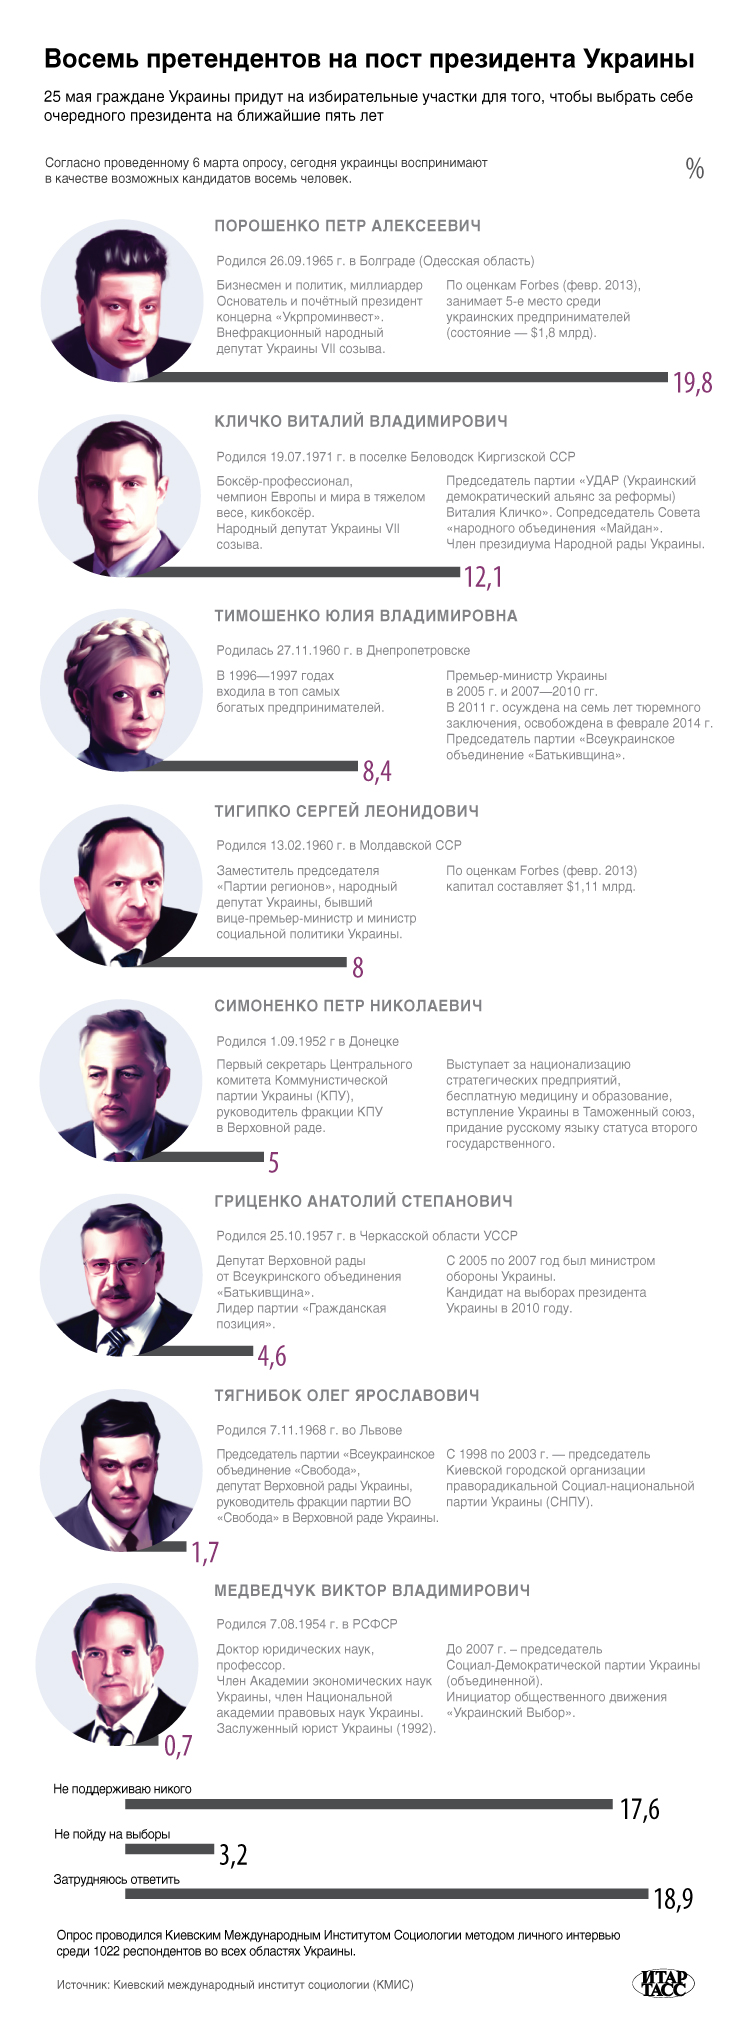 Восемь претендентов на пост президента Украины